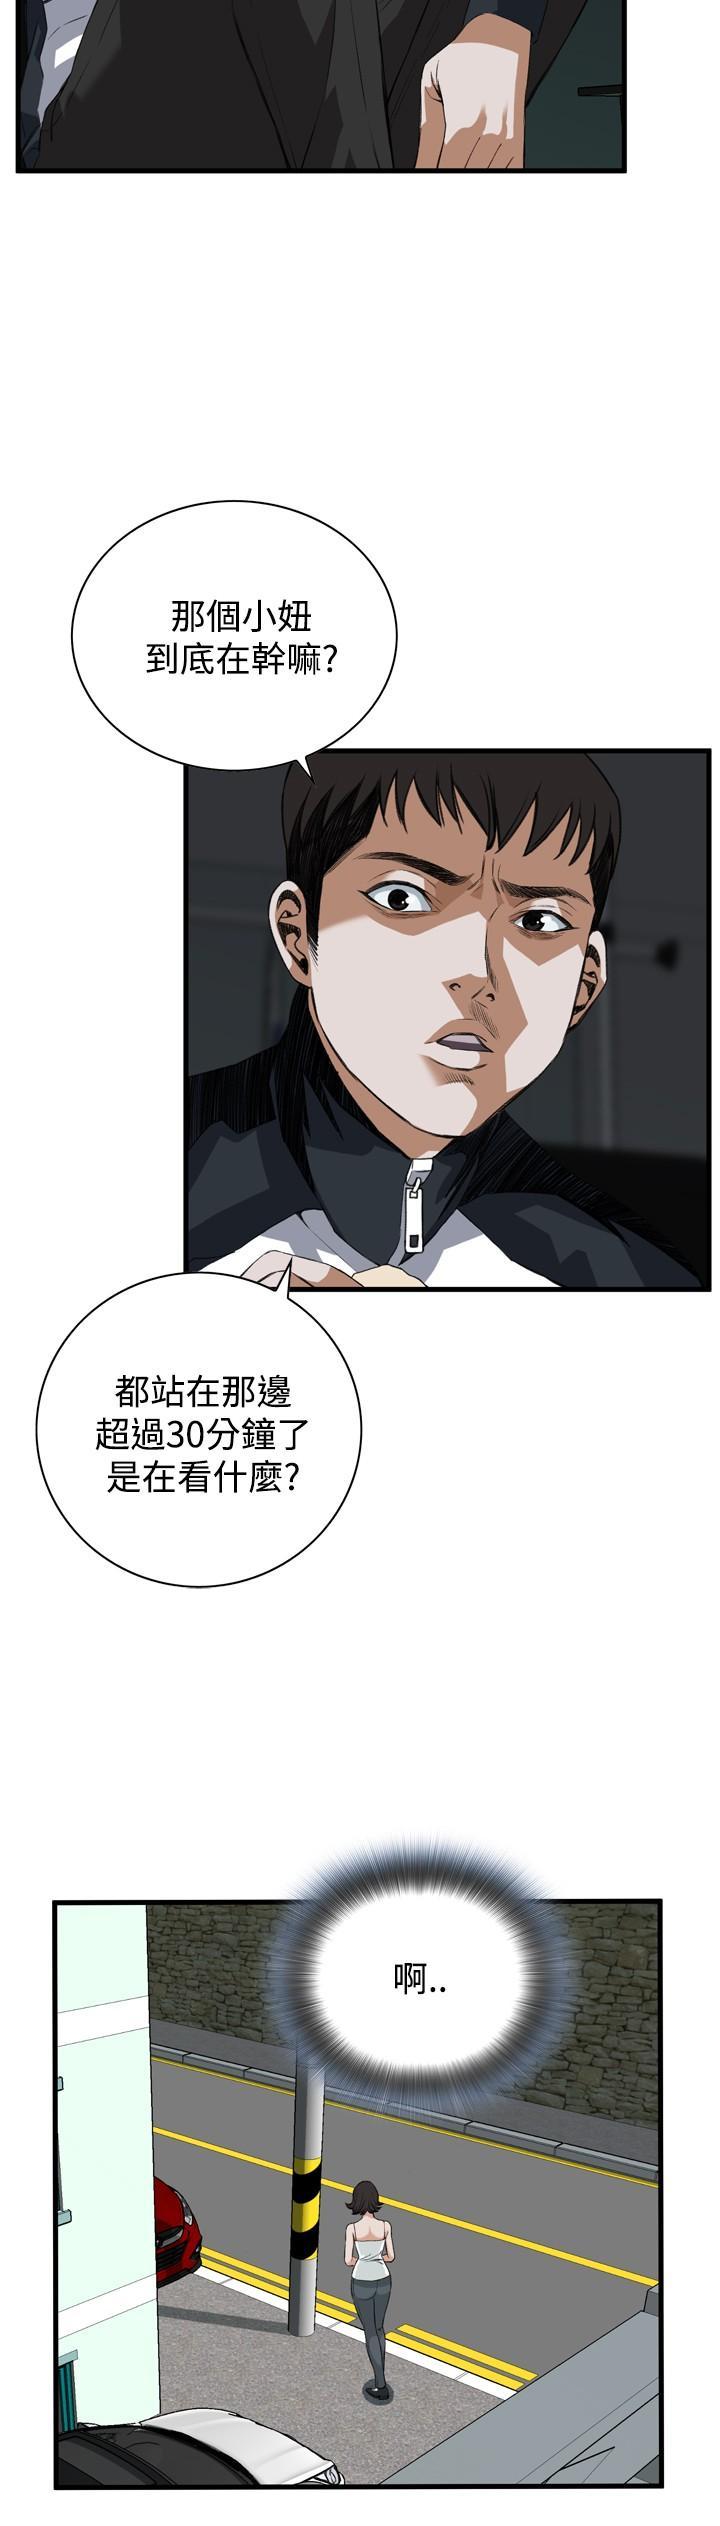 Take a Peek 偷窥 Ch.39~60 [Chinese]中文 218